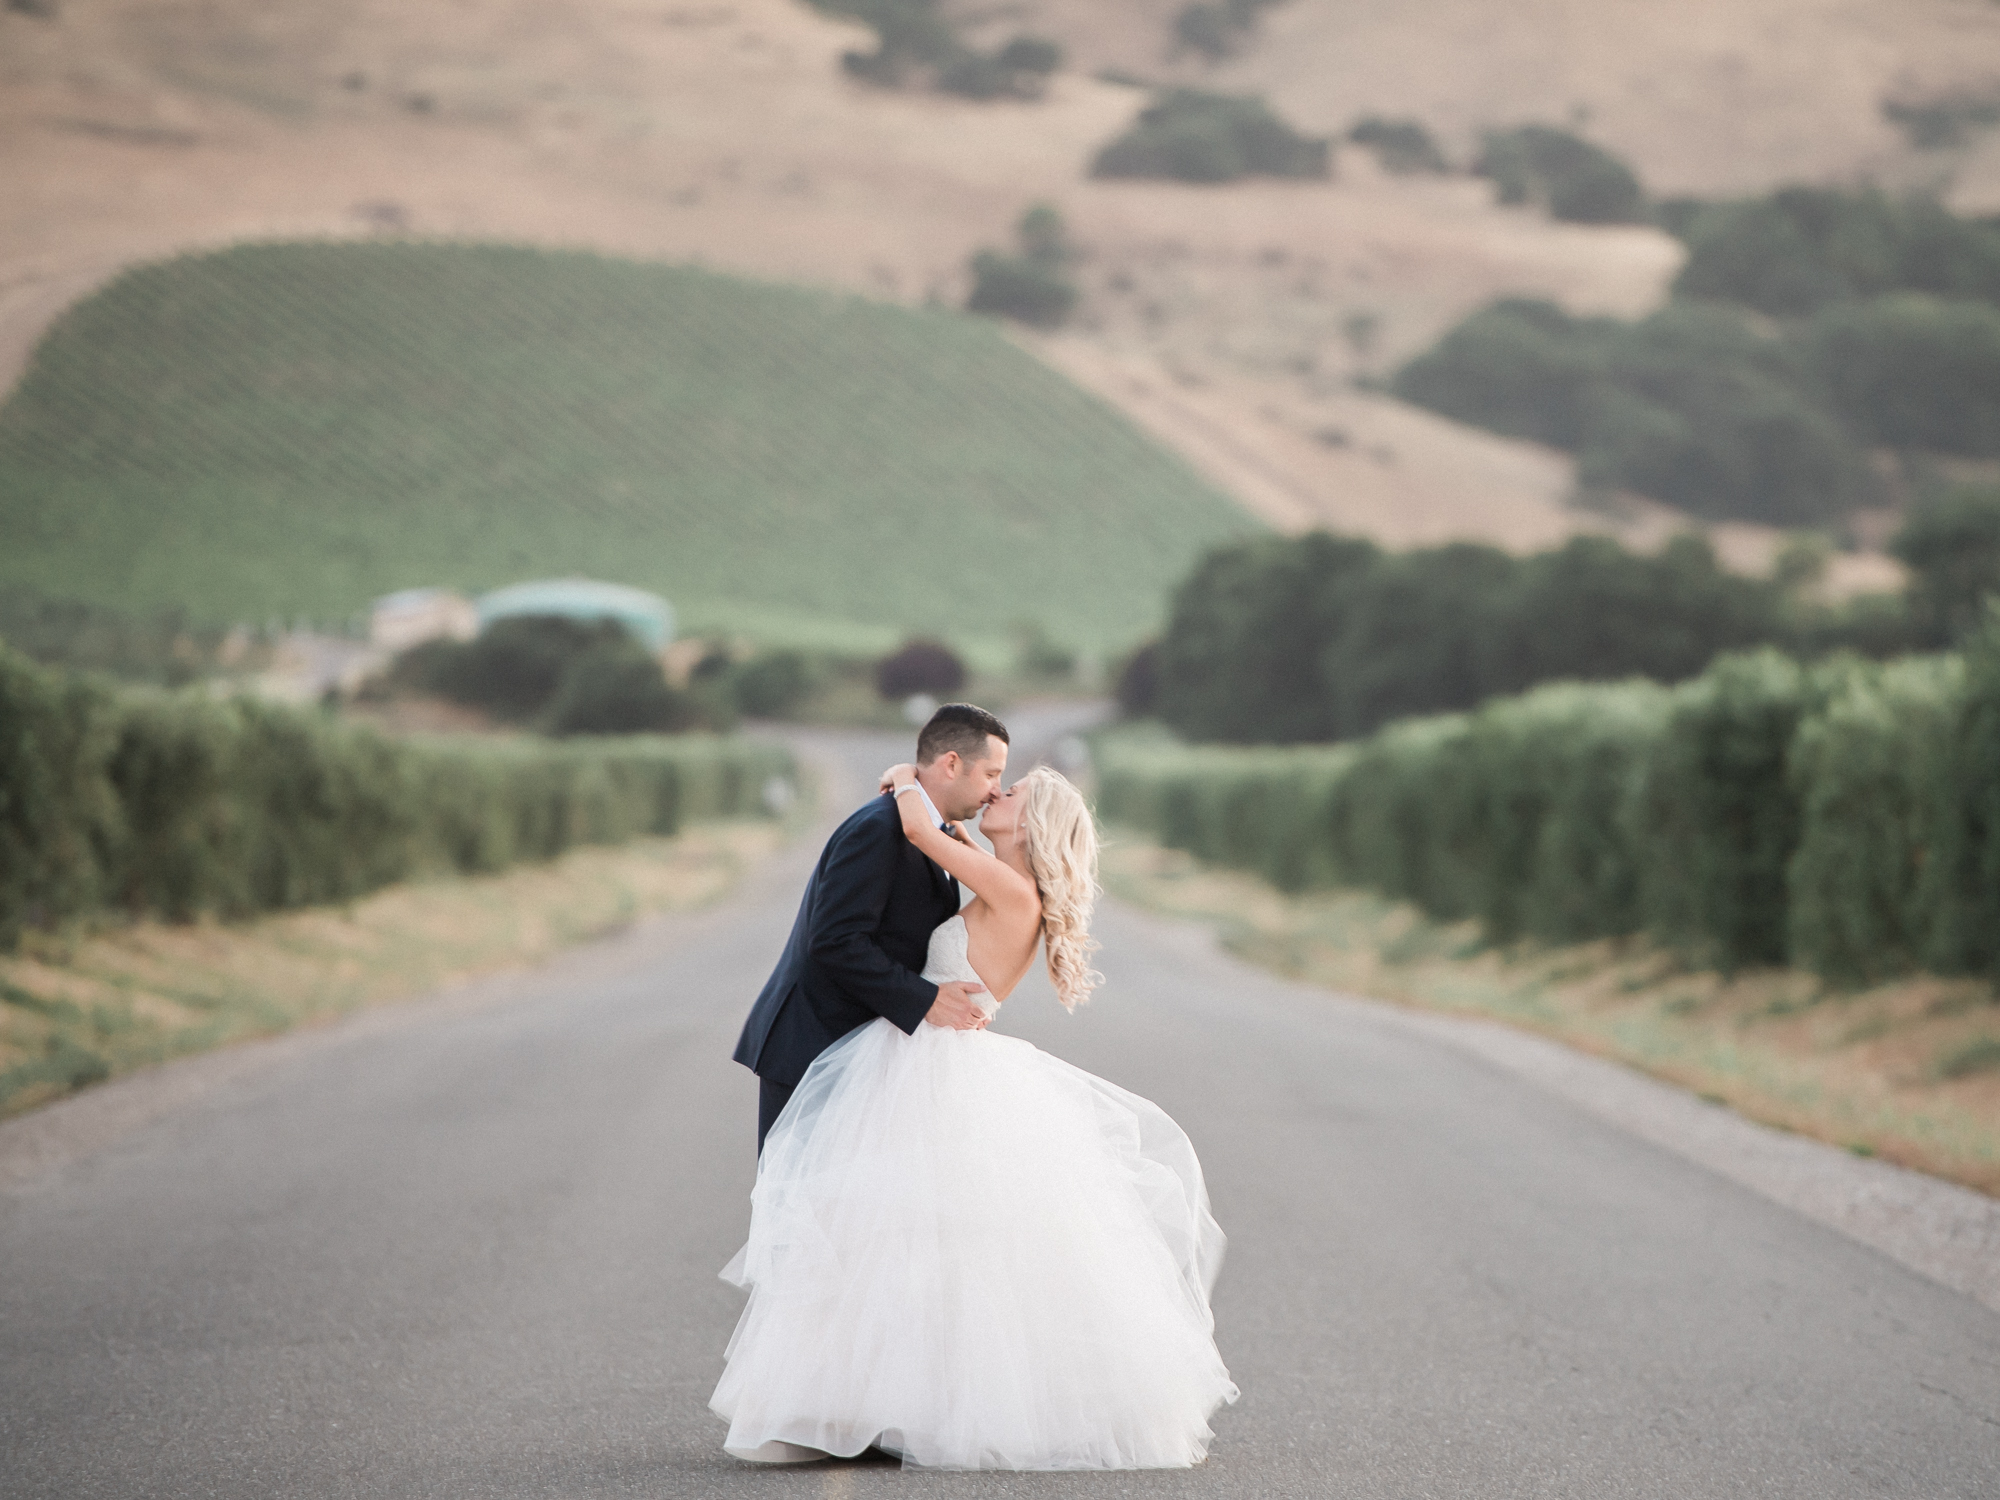 Aimee+Logan_wedding_spp-129.jpg